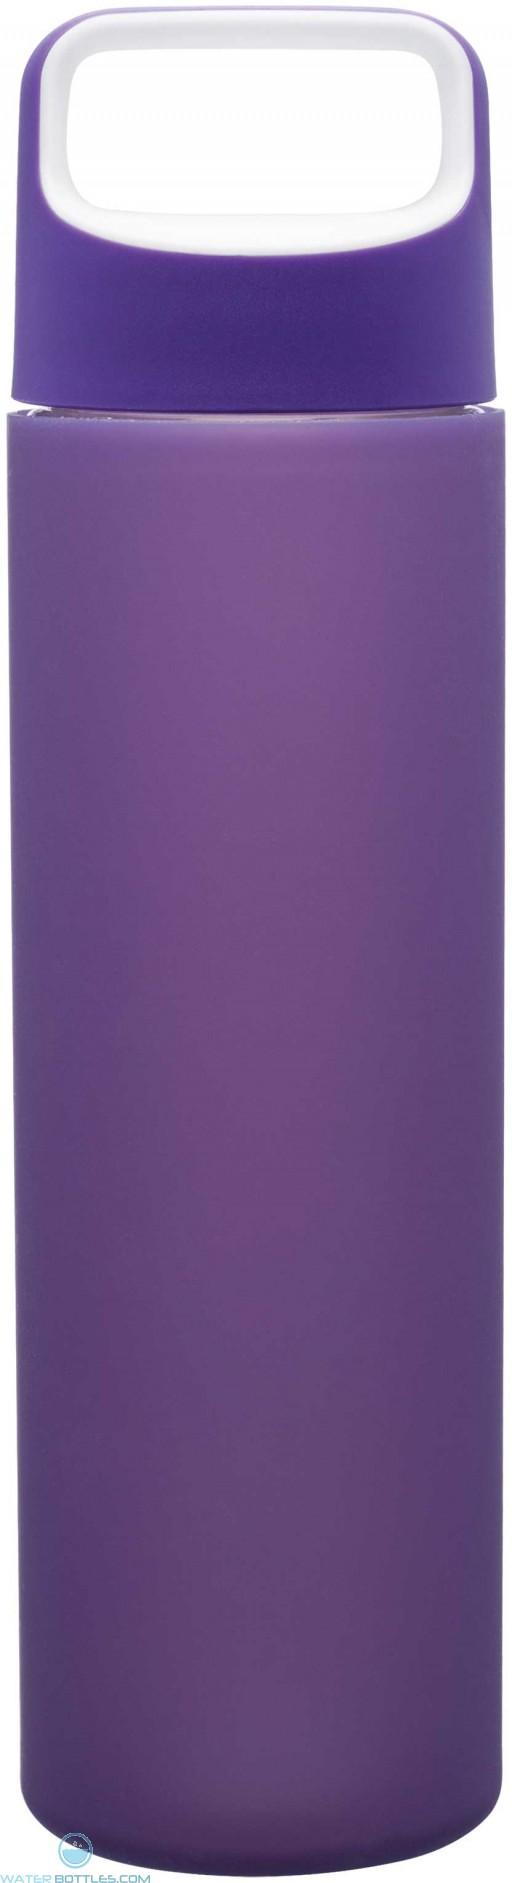 H2Go Inspire Glass Water Bottles | 18 oz - Purple